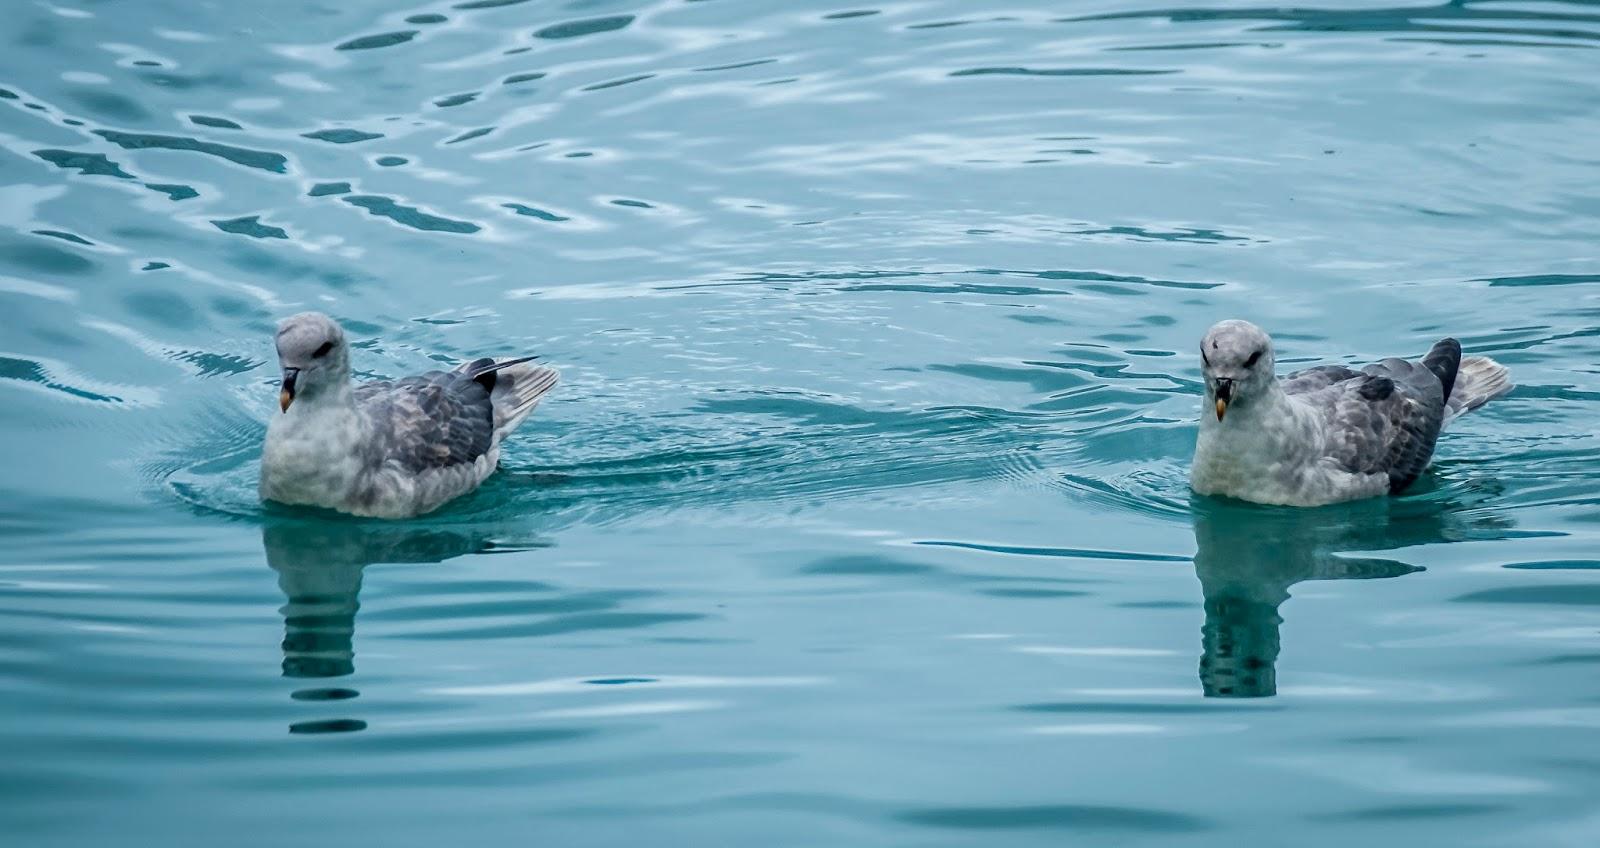 oiseau faune svalbard spitzberg